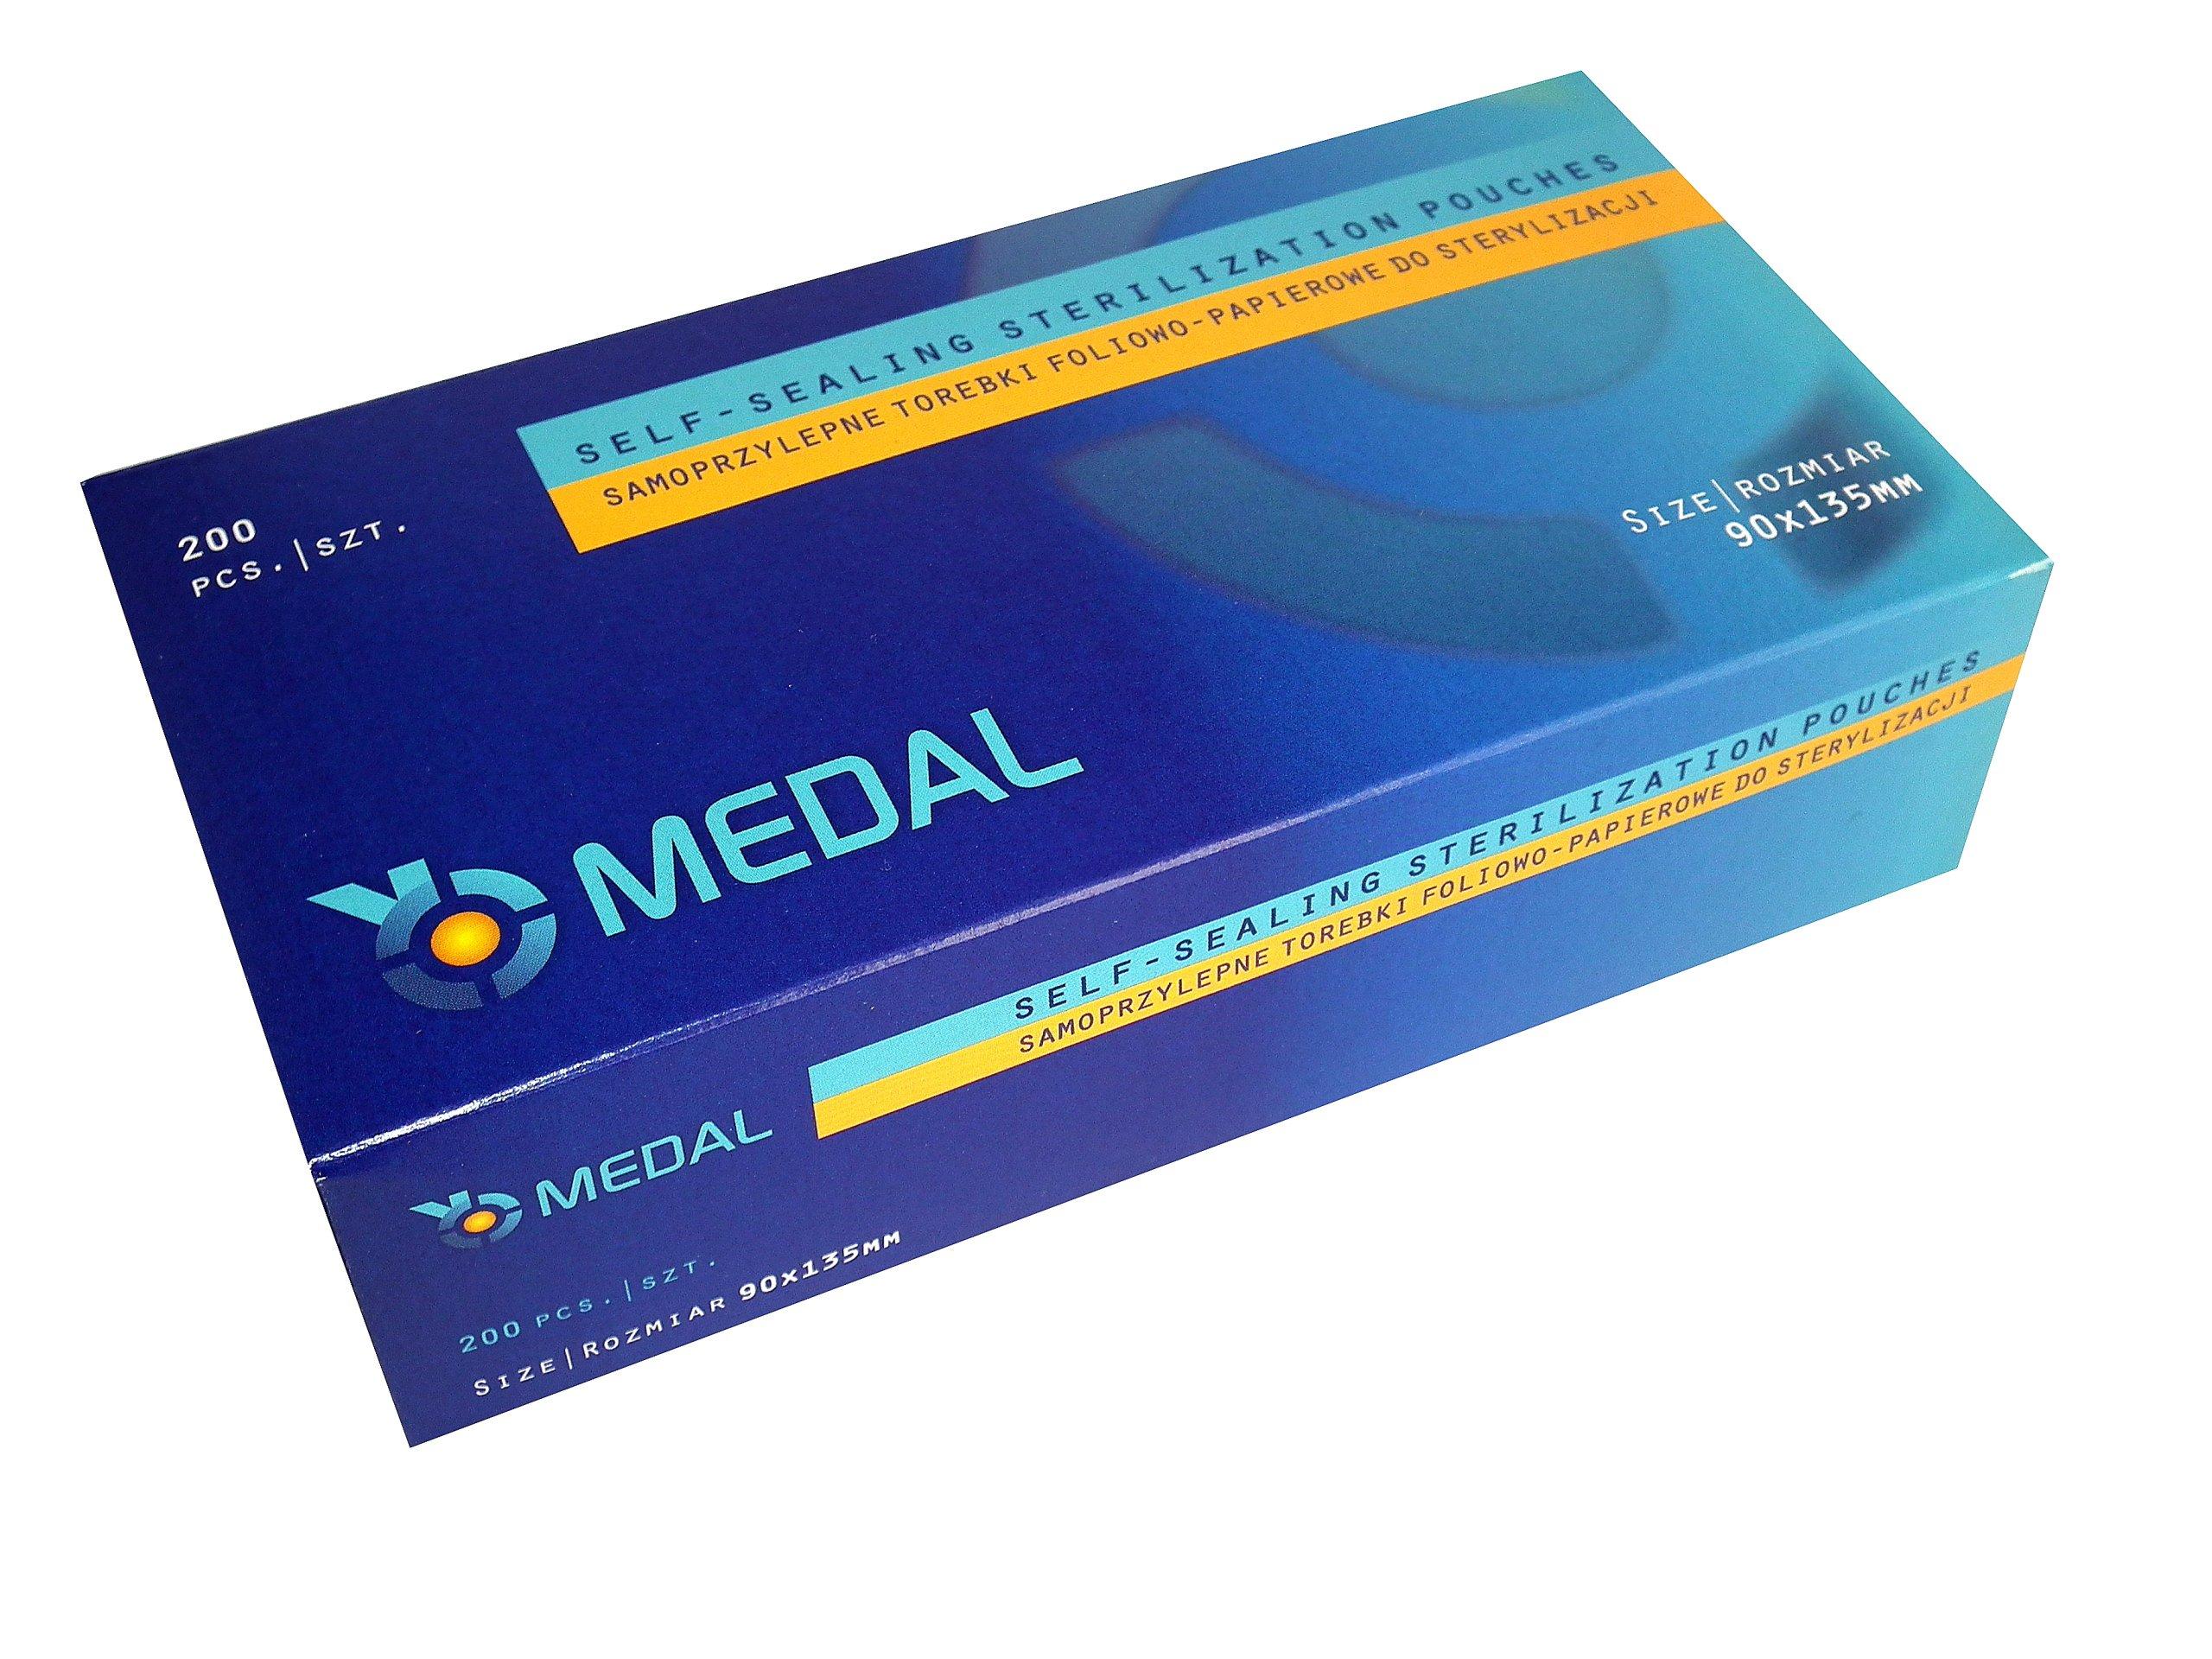 Item PACKAGES FOR STERILIZATION 90mm x 135mm MEDAL 200 PCs